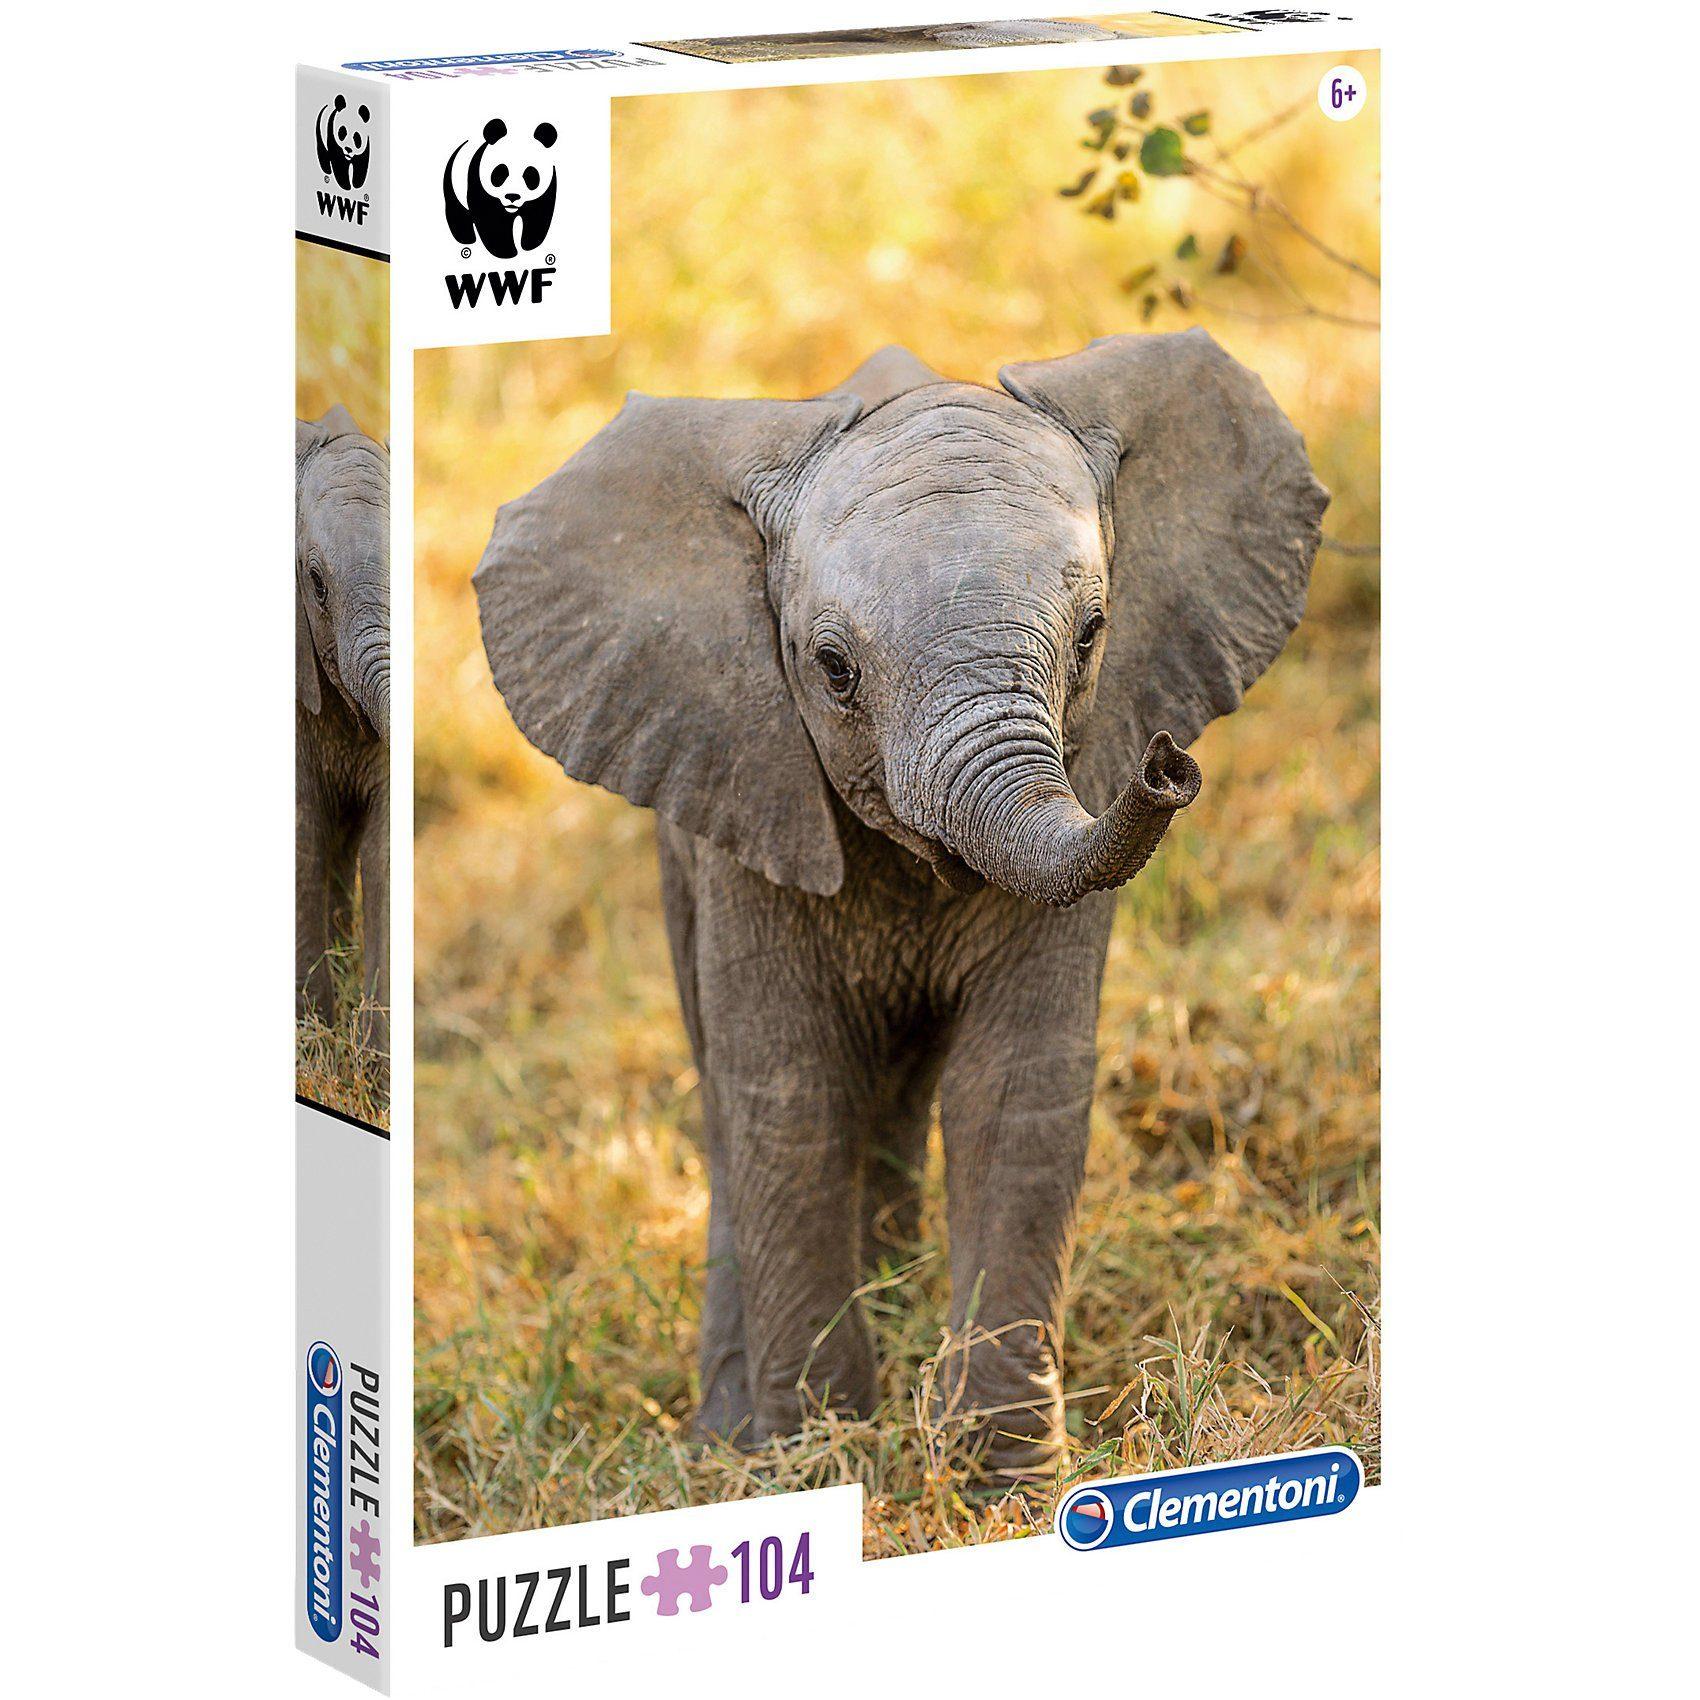 Clementoni® WWF Puzzle 104 Teile - Elefant